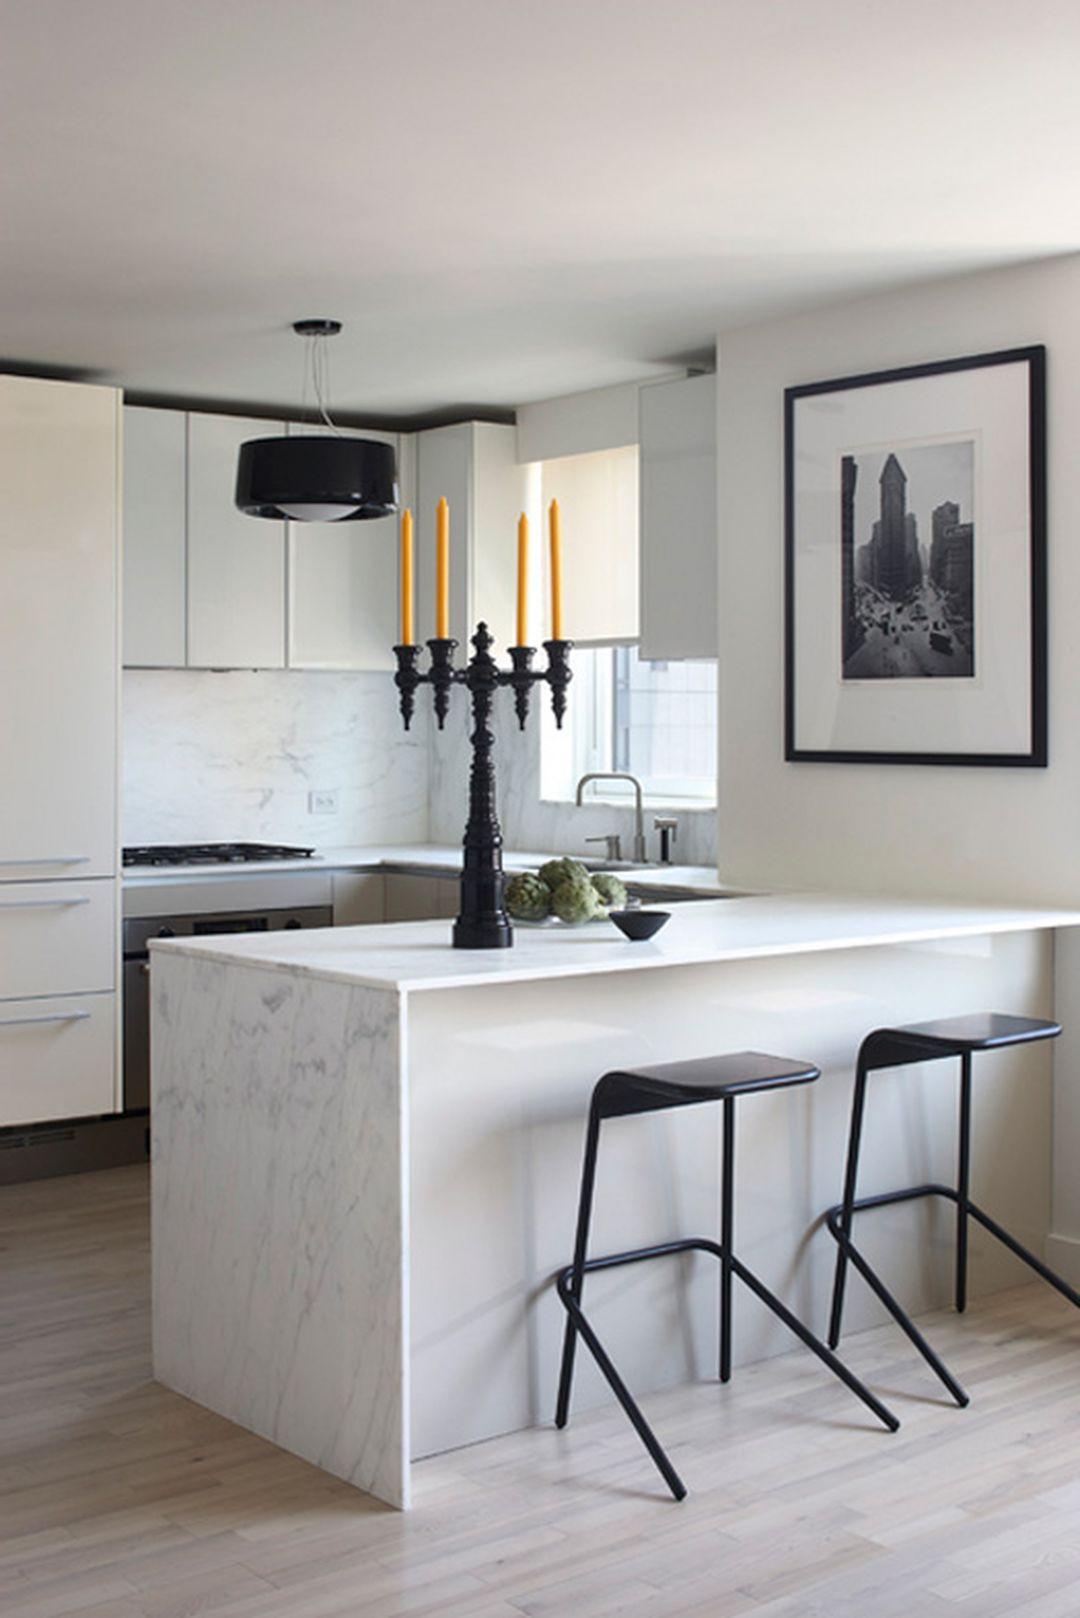 c6c41757b5a9daebac570a6af1e2bd7a - 40+ Kitchen Modern Small House Interior Design Images